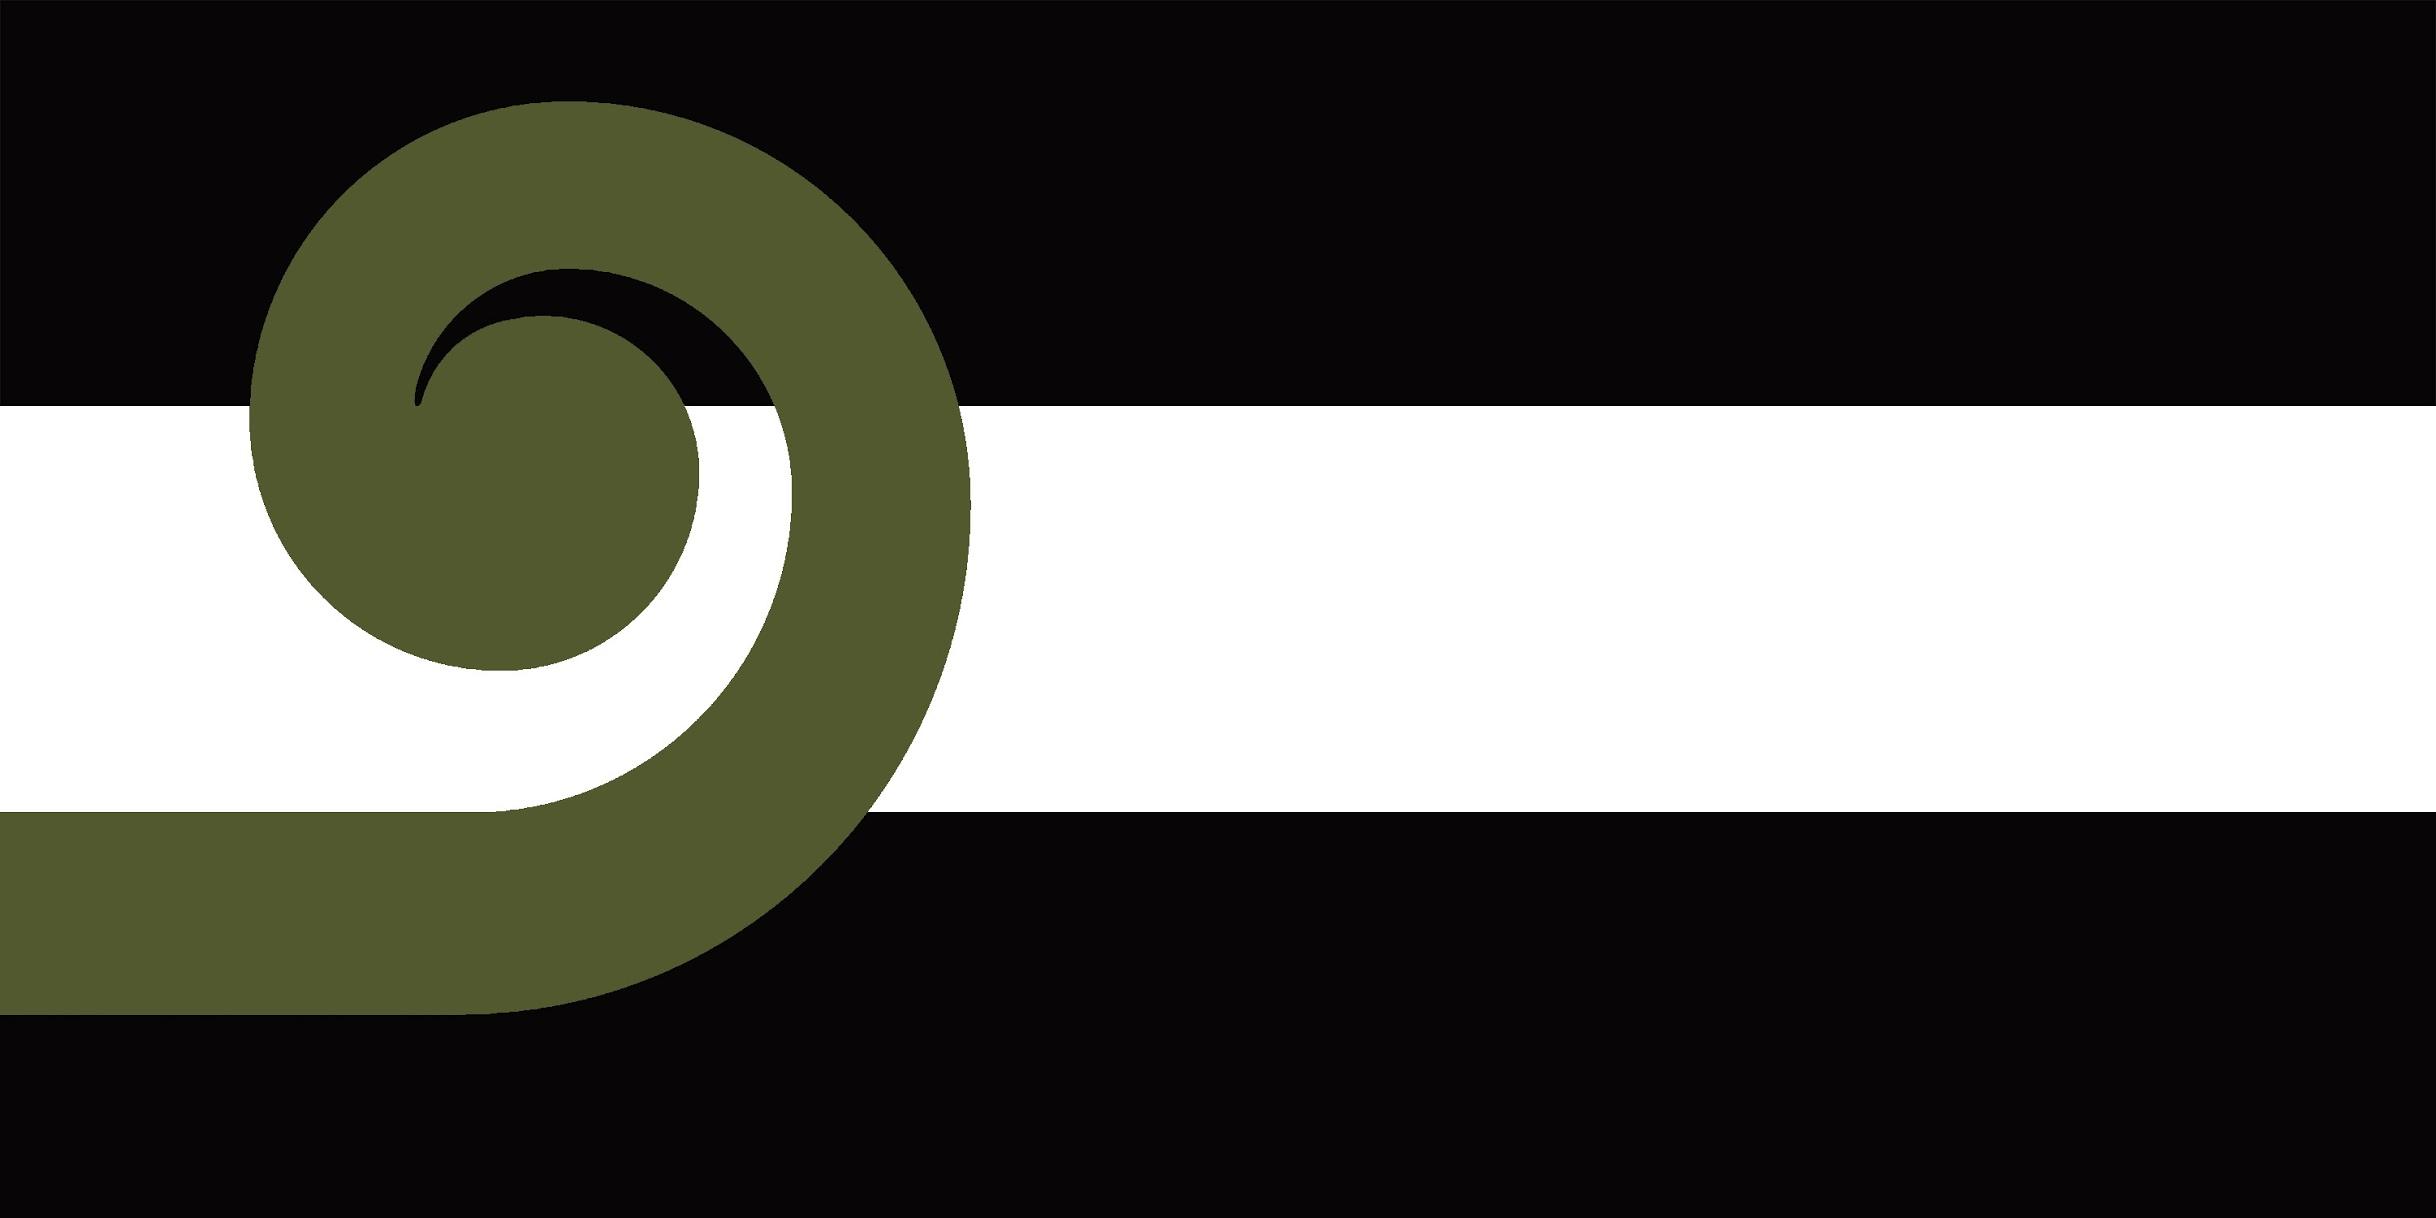 Aotearoa